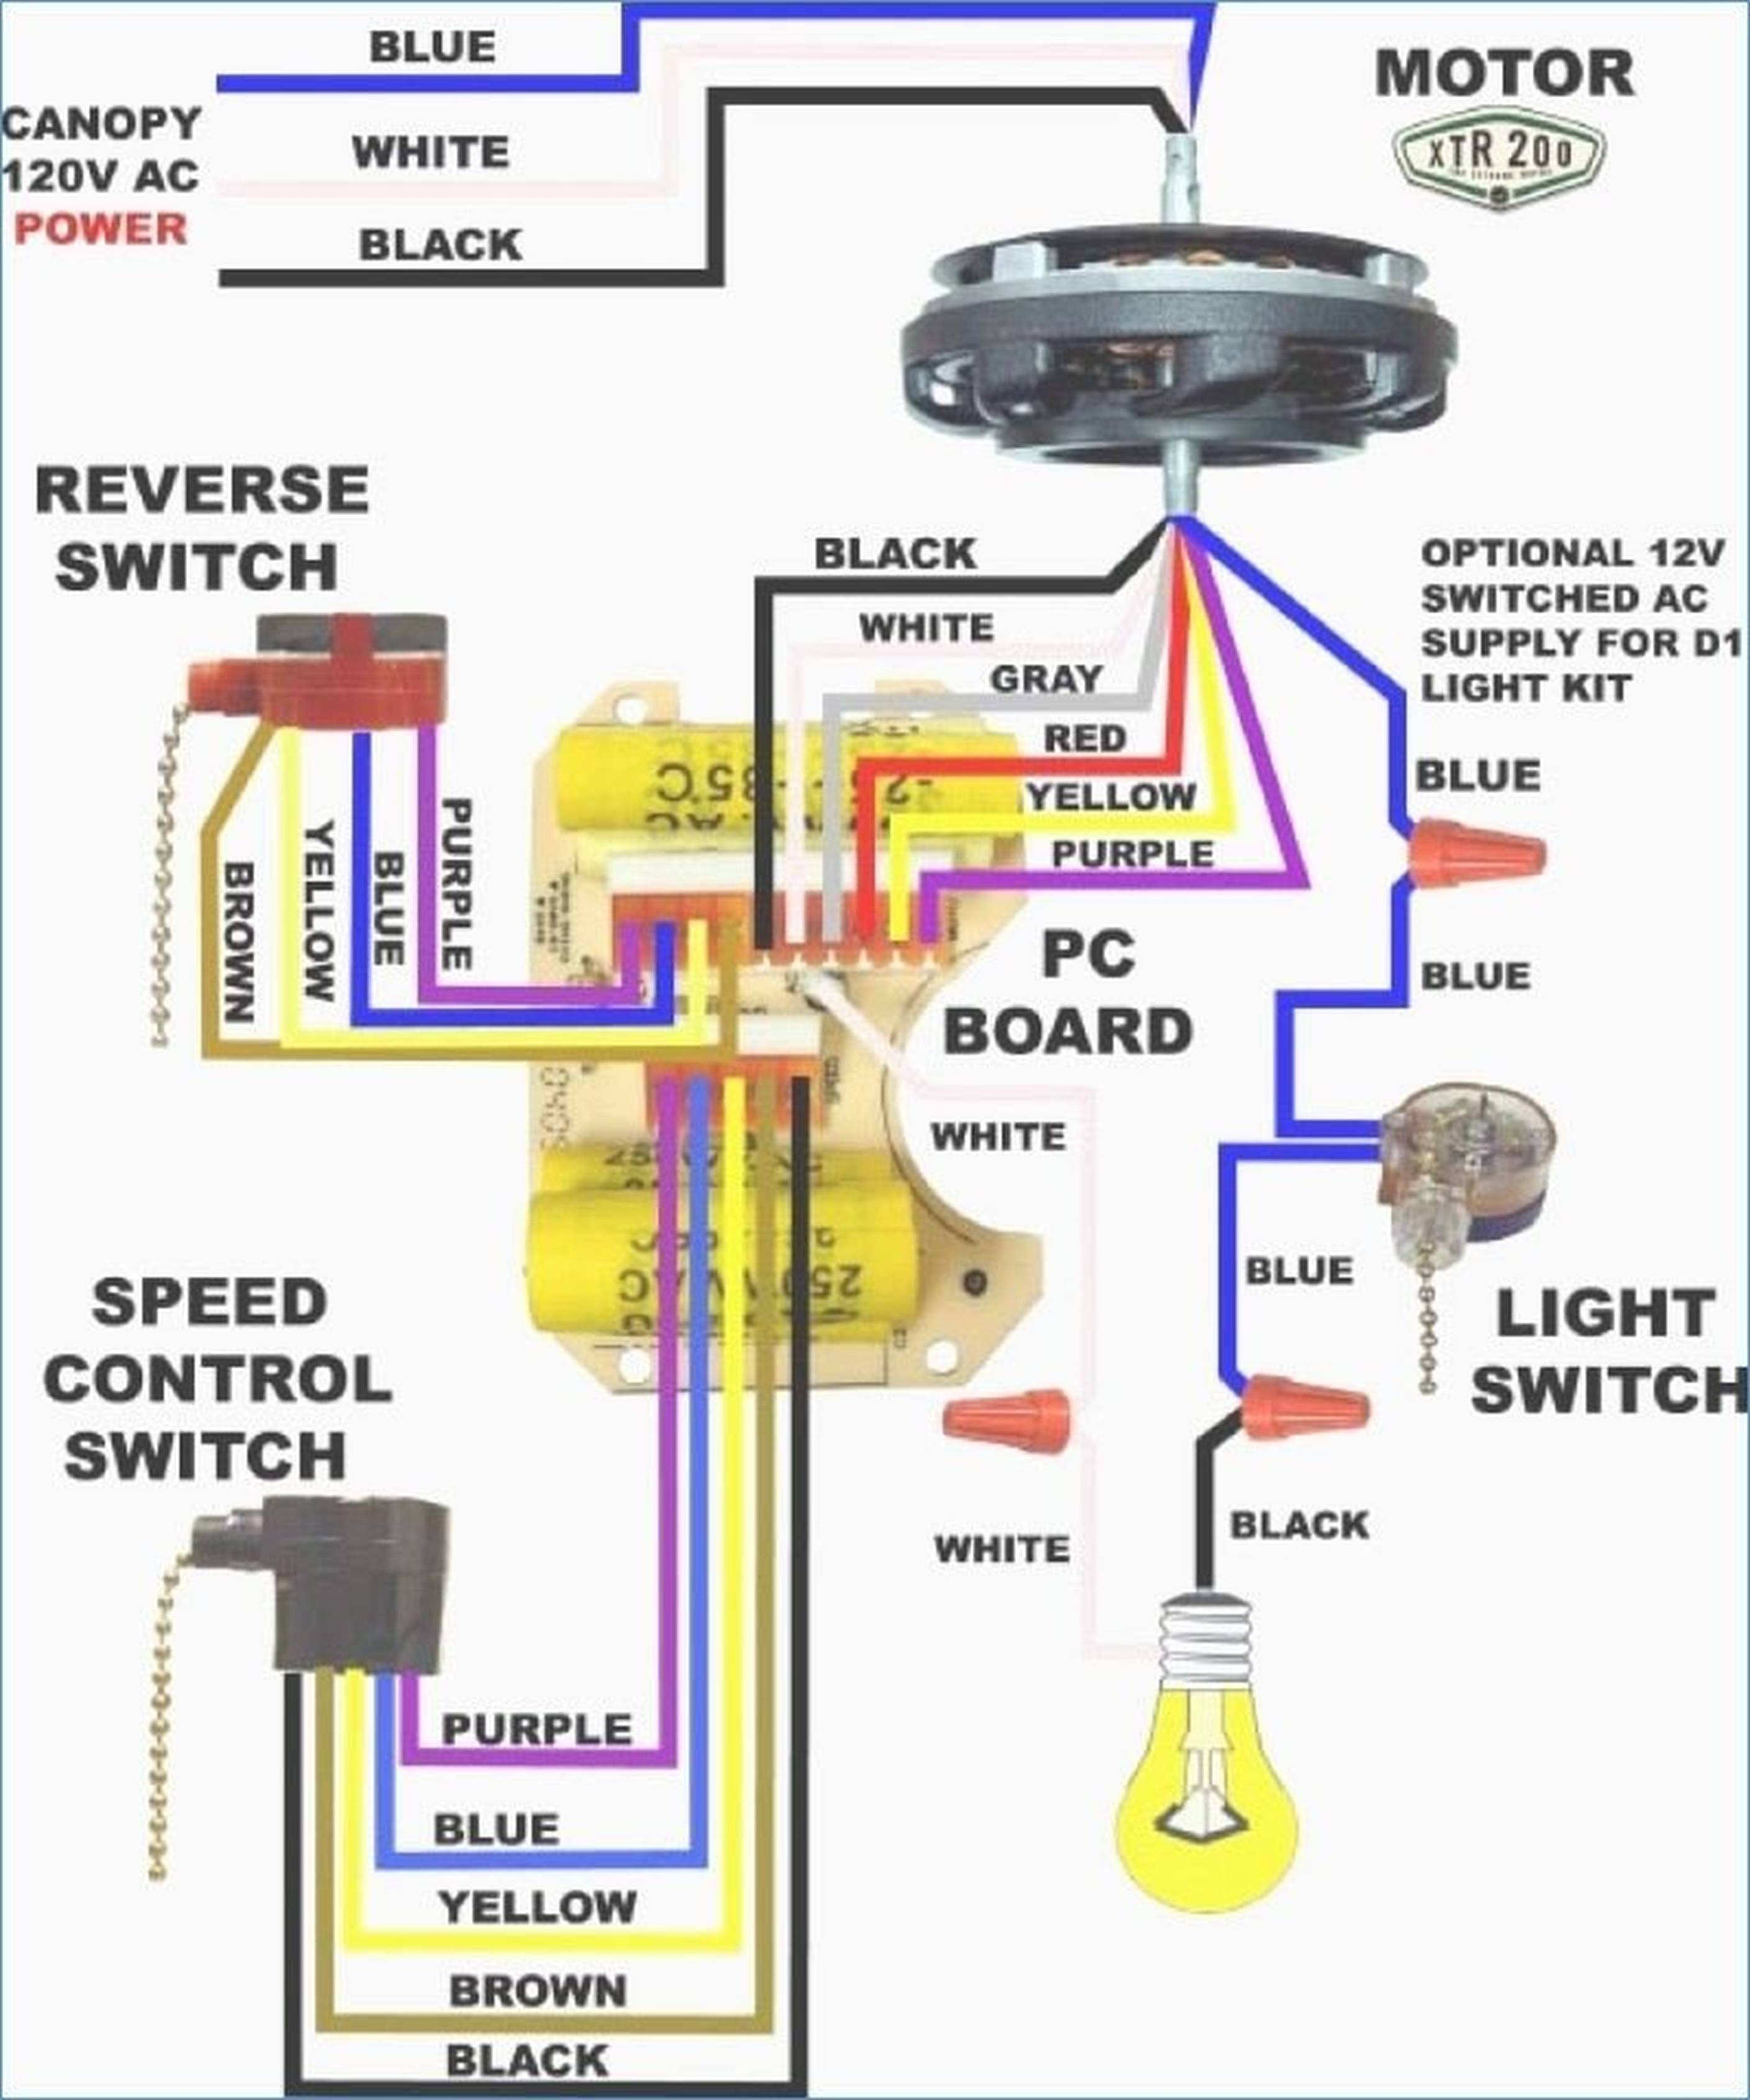 Hampton Bay Ceiling Fan Switch Wiring Diagram | Wiring Diagram - Hampton Bay 3 Speed Ceiling Fan Switch Wiring Diagram